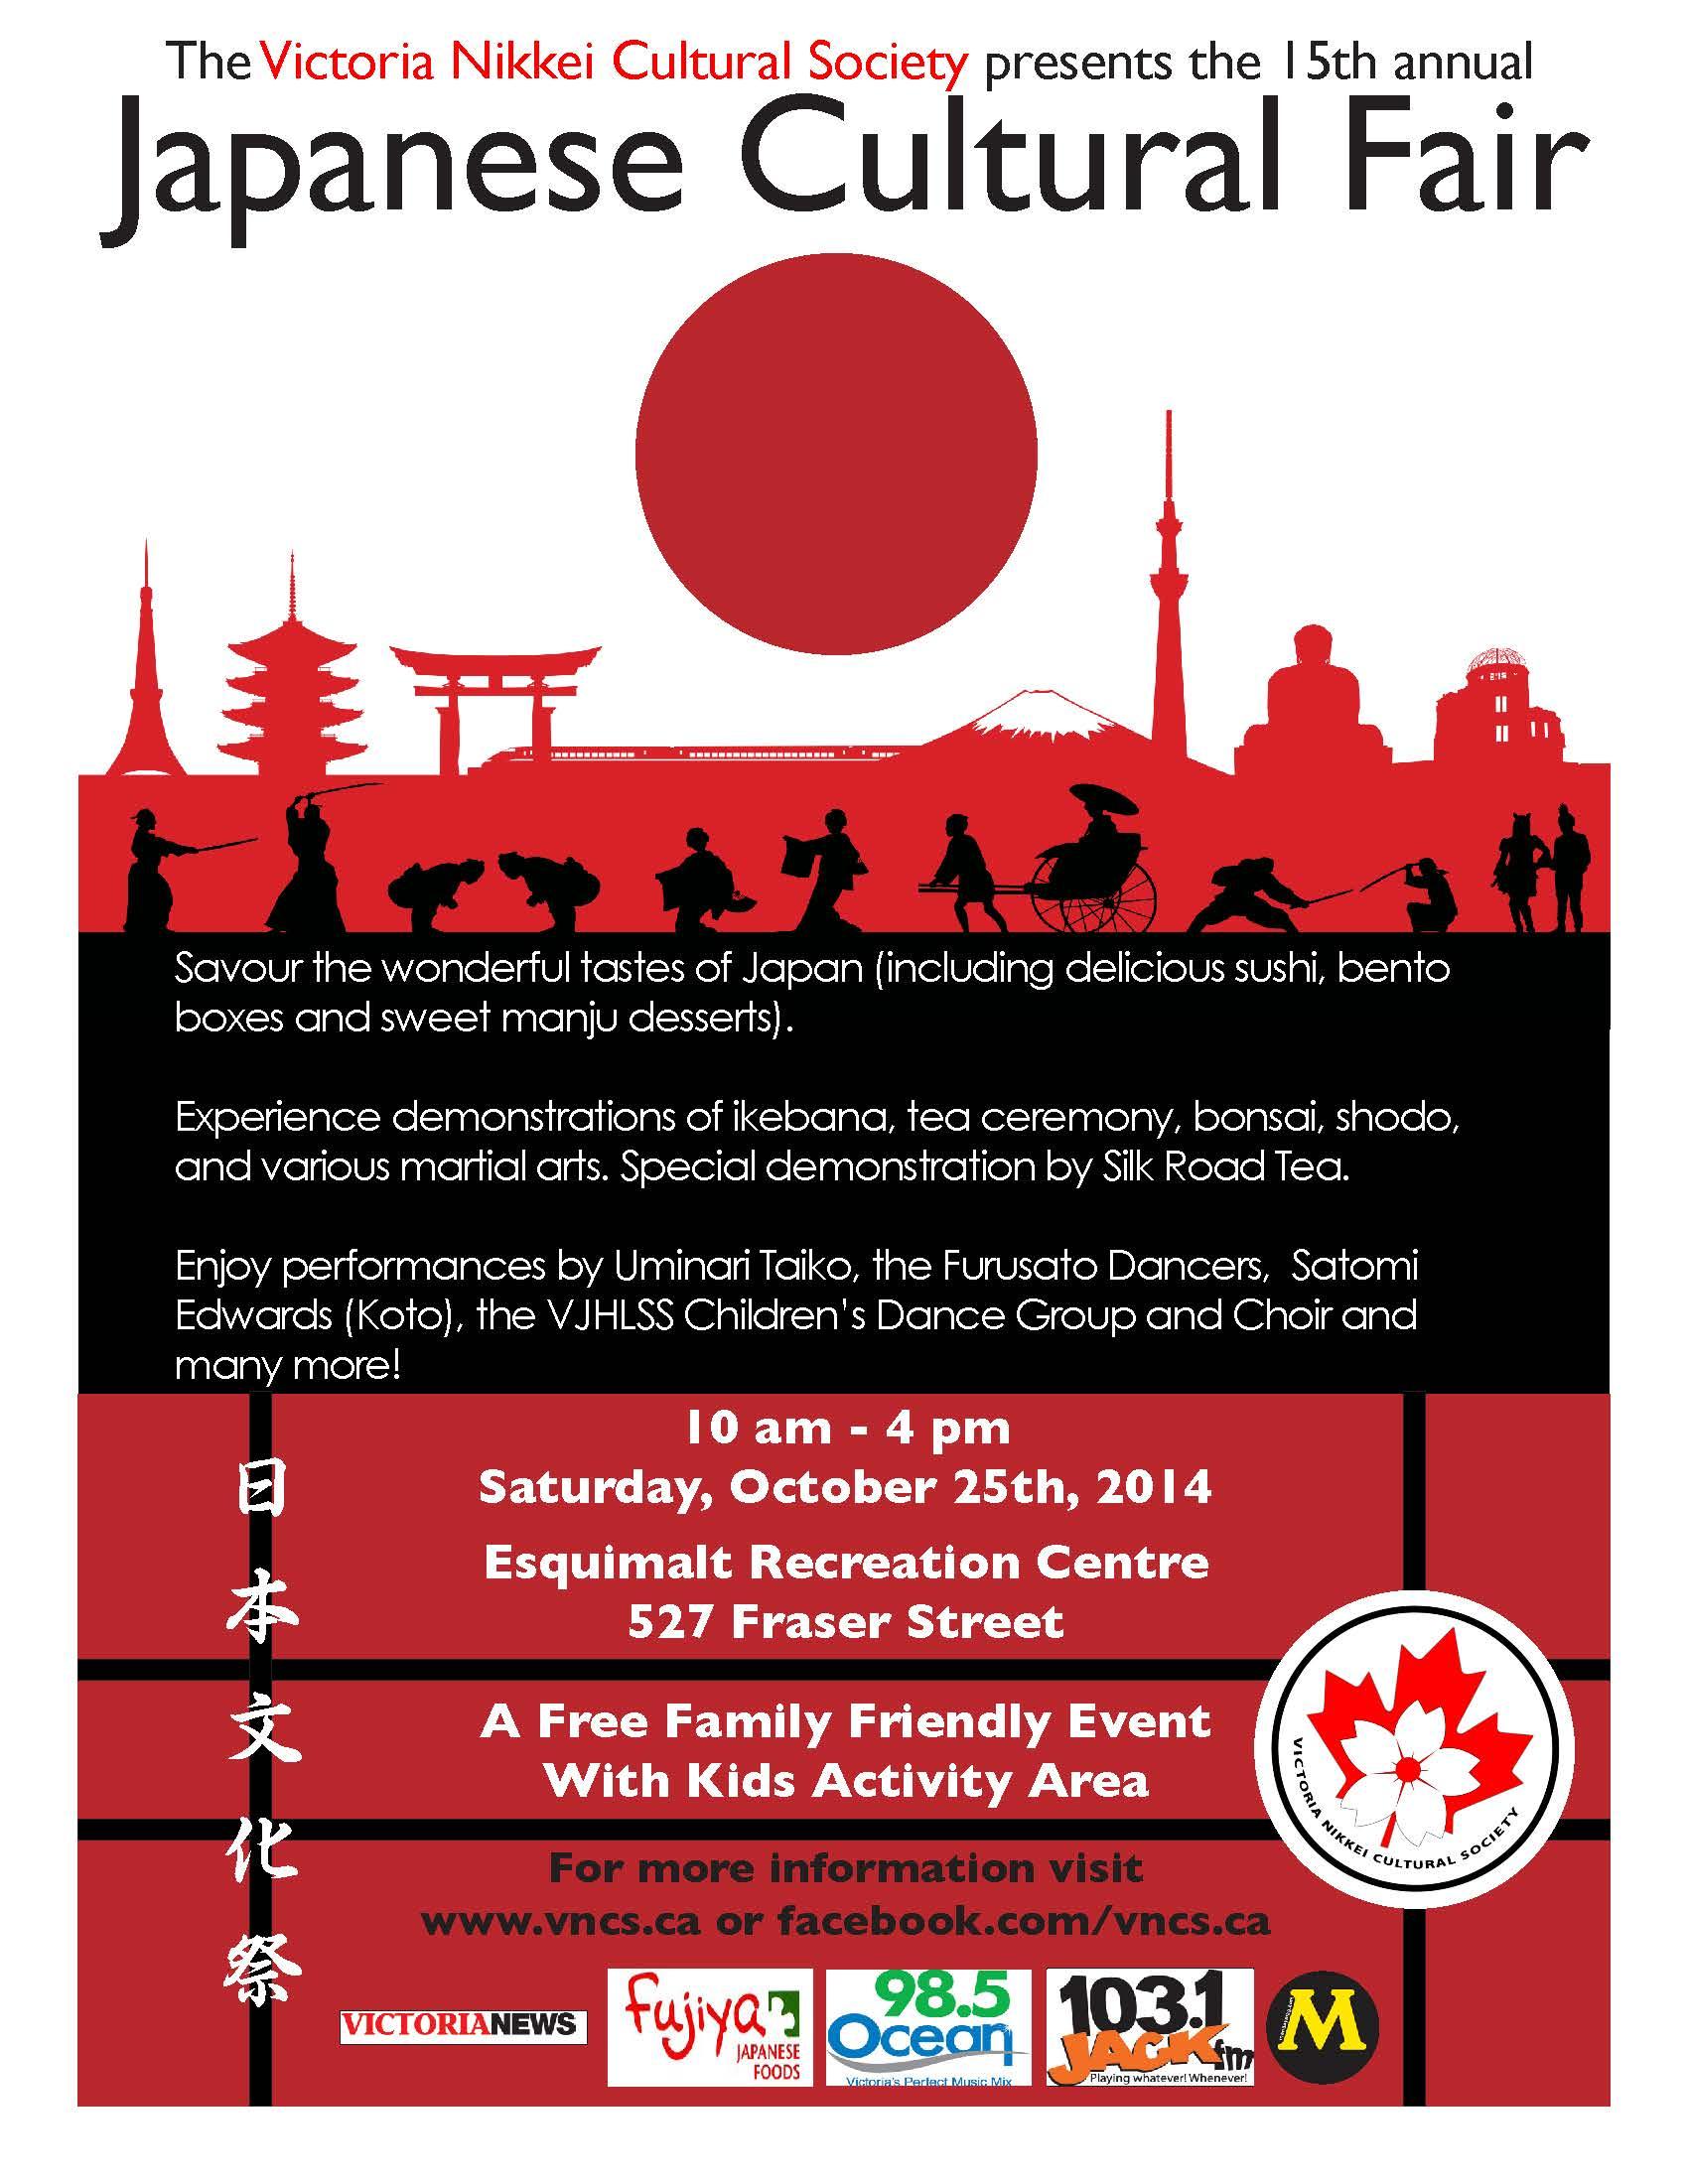 2014 VNCS Japanese Cultural Fair Poster